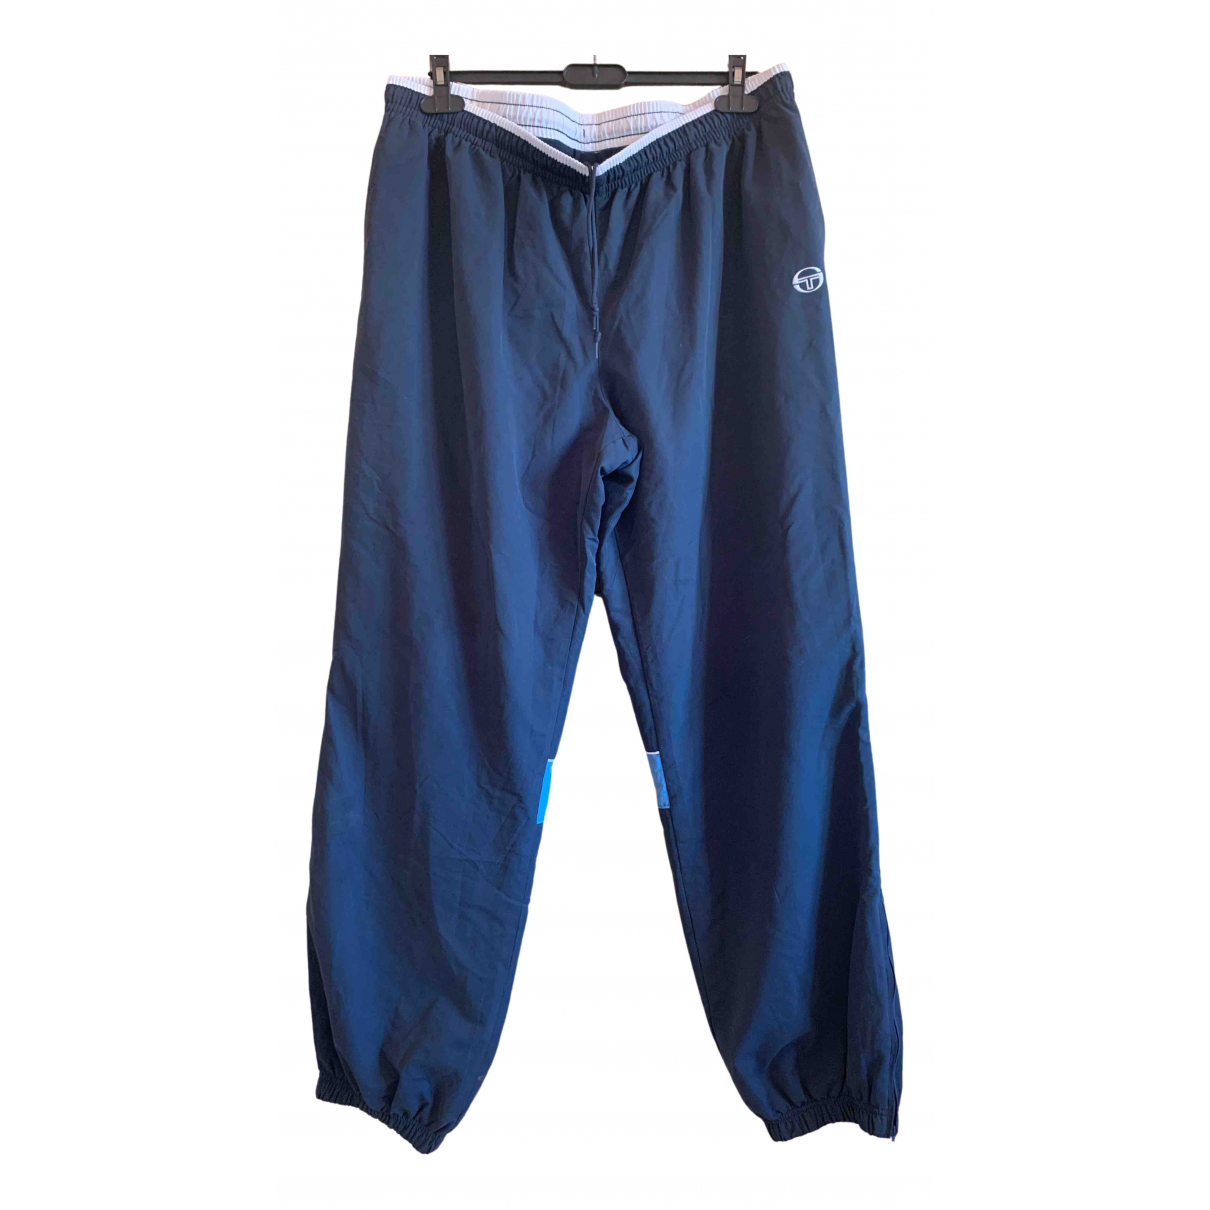 Pantalones en Poliester Azul Sergio Tacchini